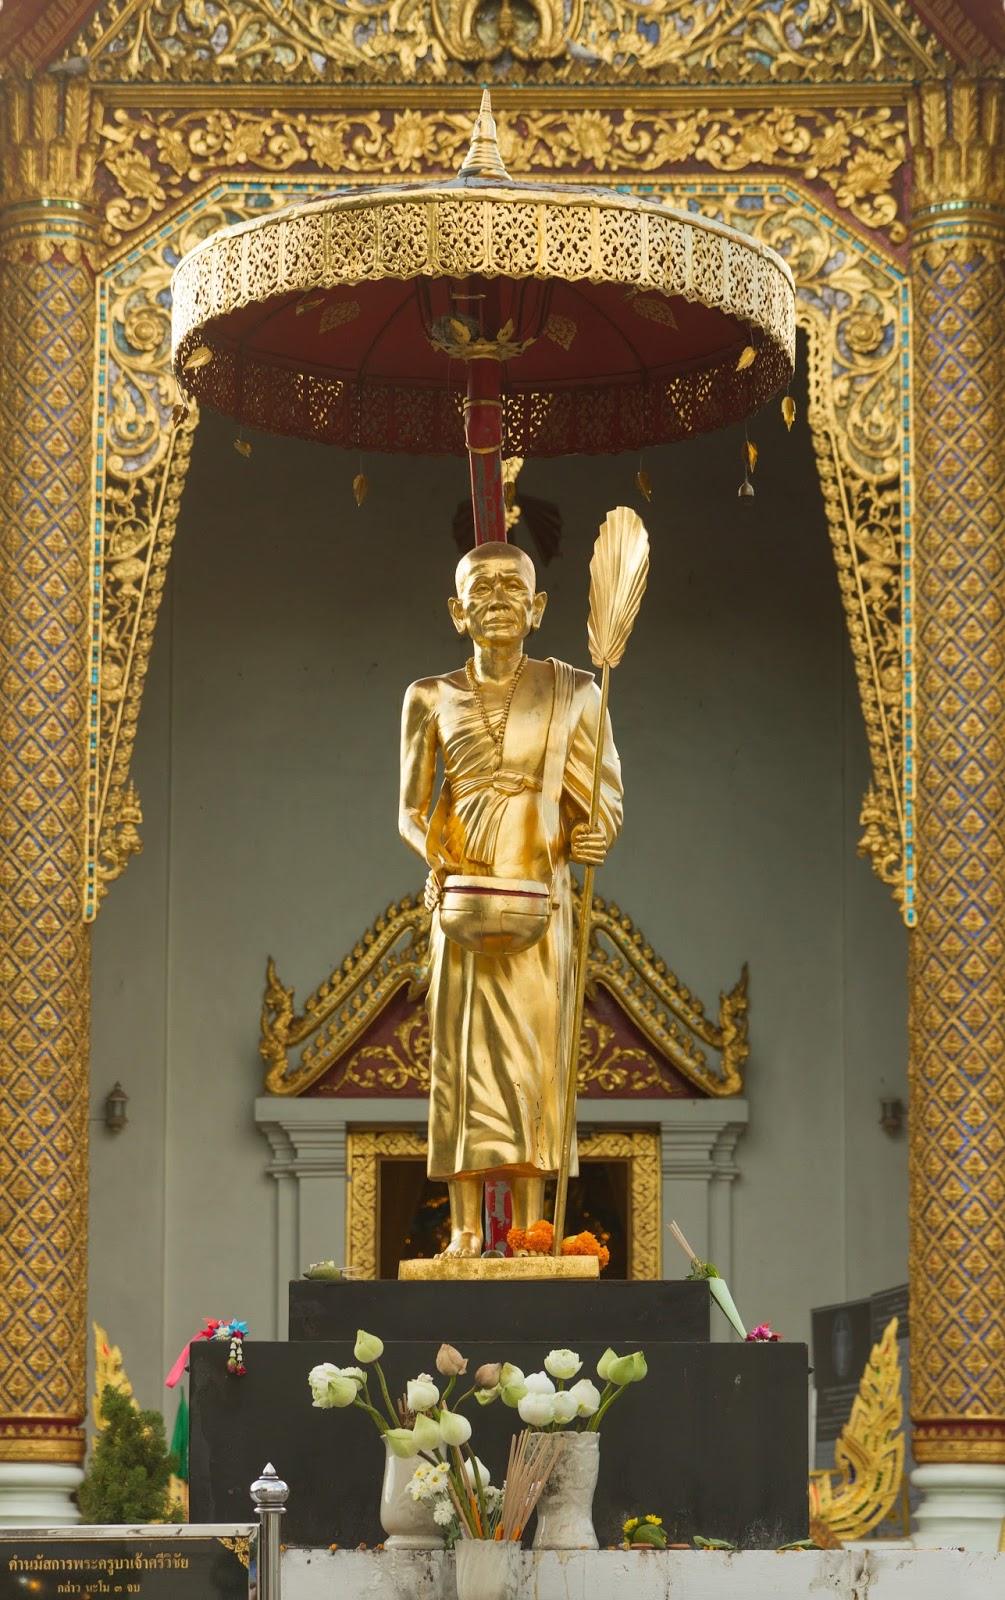 Golf Monk at Wat Phra Singh Temple, Chiang Mai Thailand